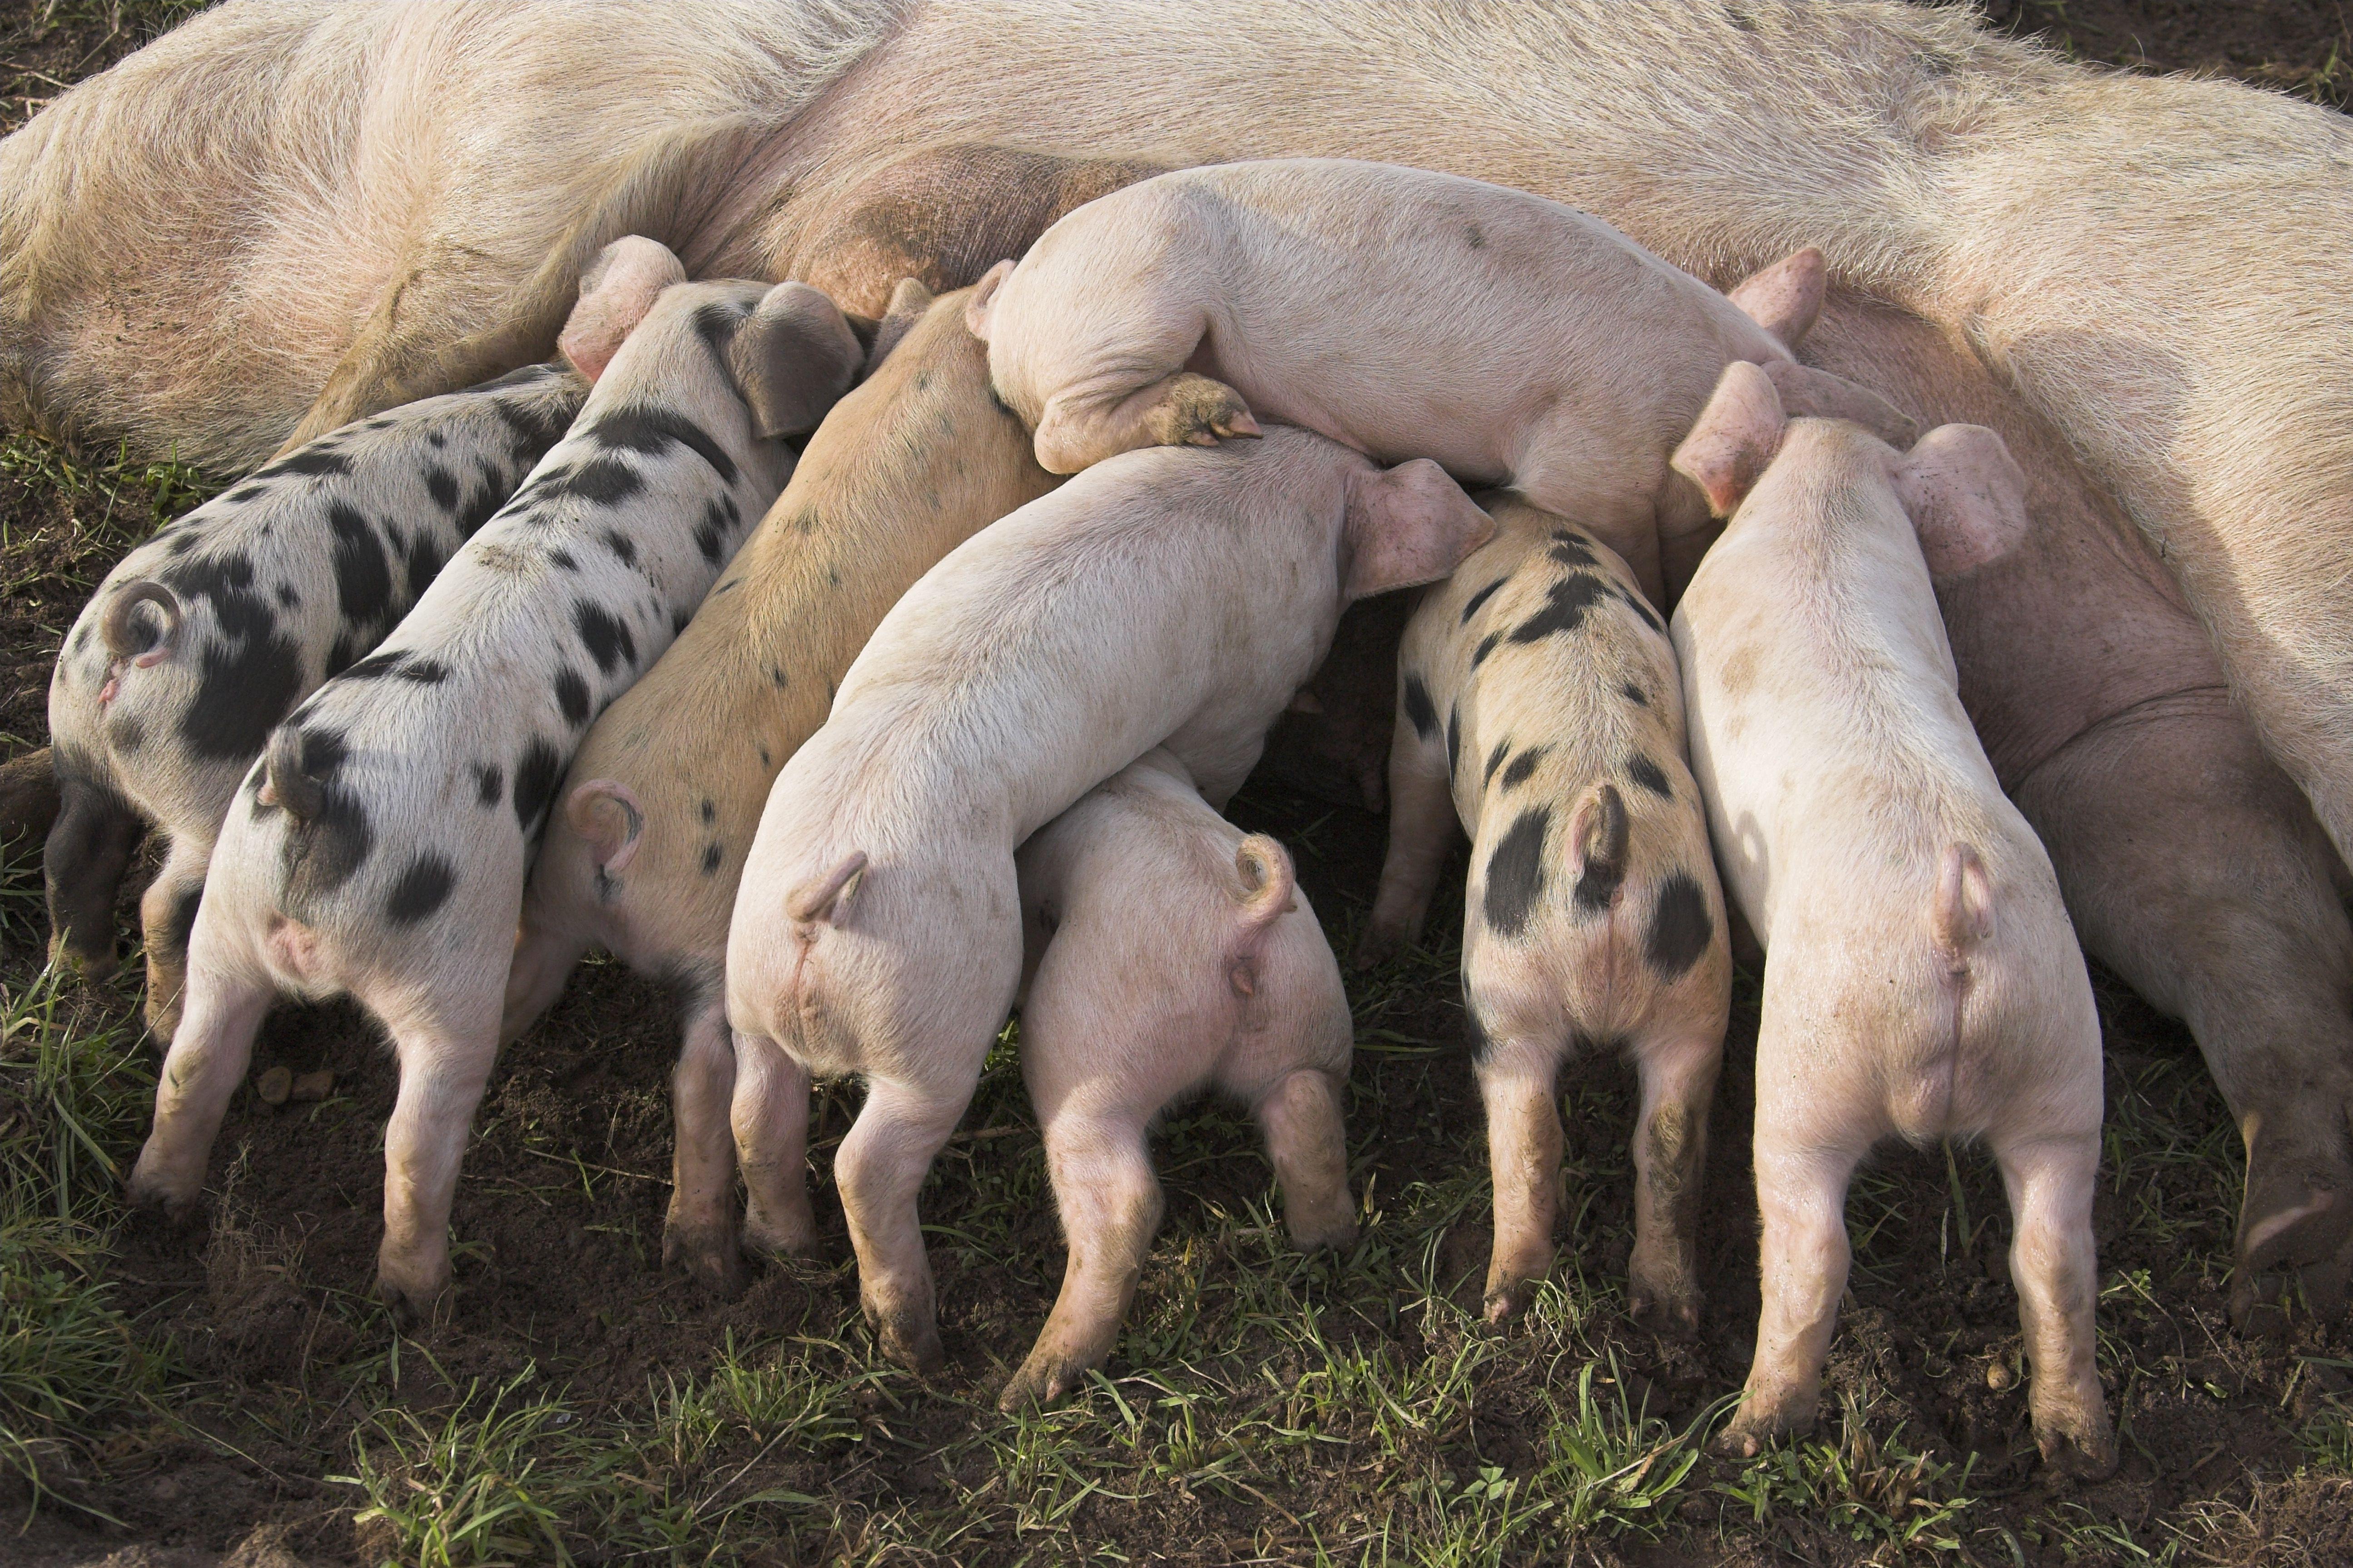 Farrowing Crates Prevent Pigs Turning Rspca Assured Pigs Aren T Kept In Farrowing Crates Www Rspcaassured Org Uk Farm Animal W Animals Cute Animal Photos Pig